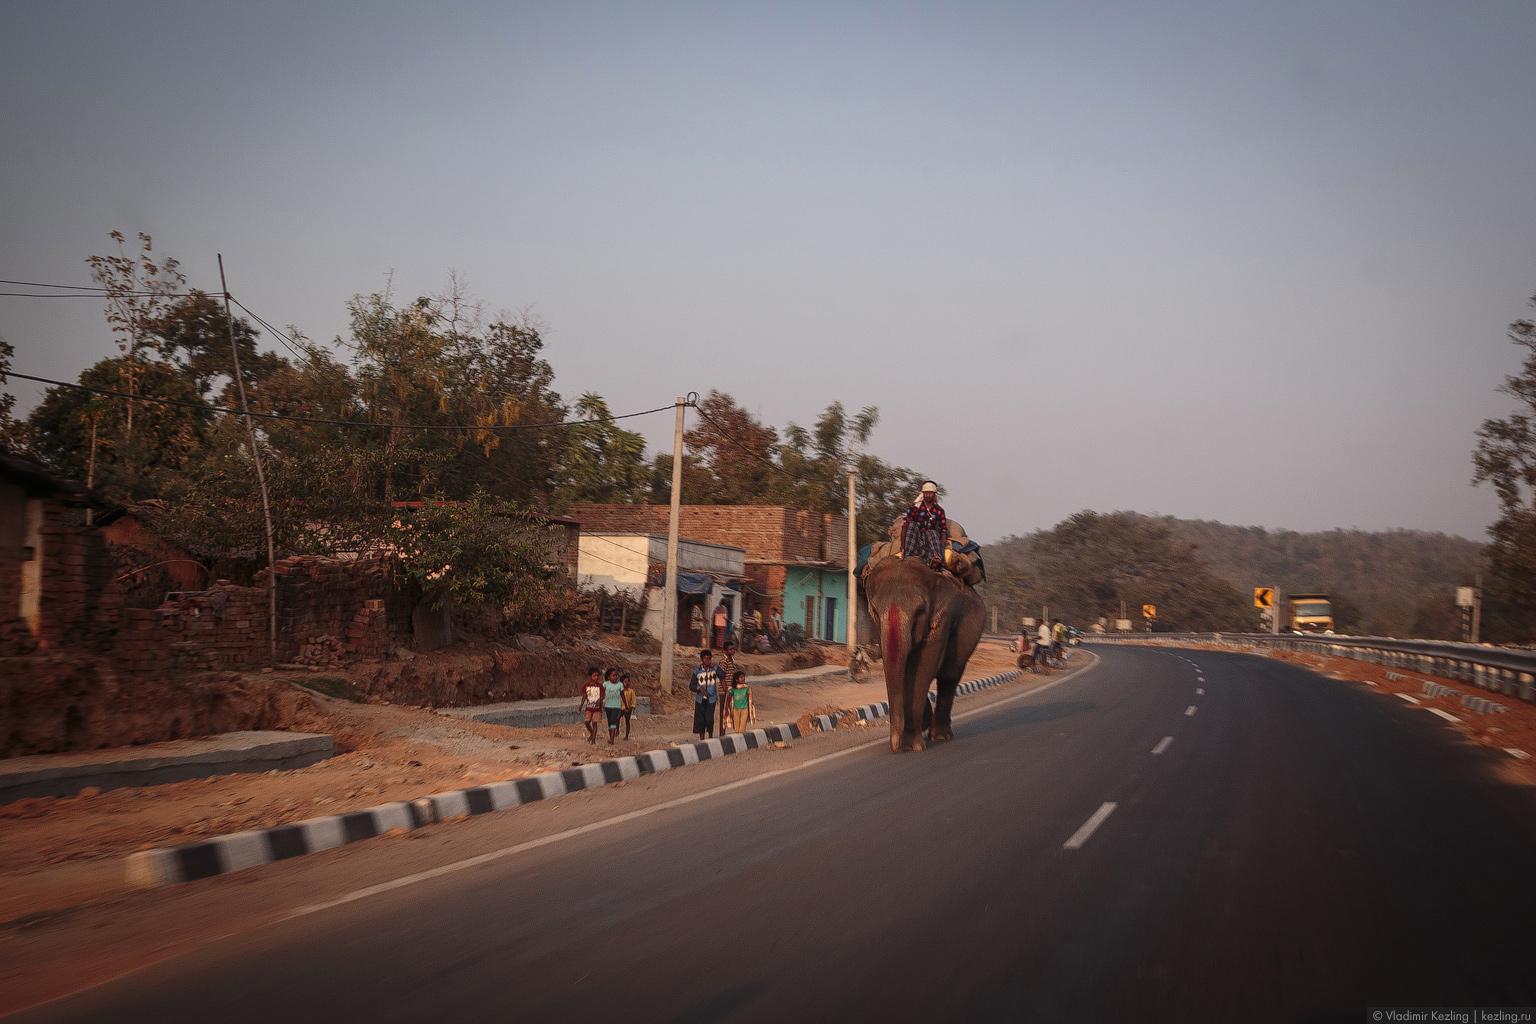 #IRFMR. Индийский этап. День 1. «The road began in Bhilai»: старт автопробега и дорога до Ранчи